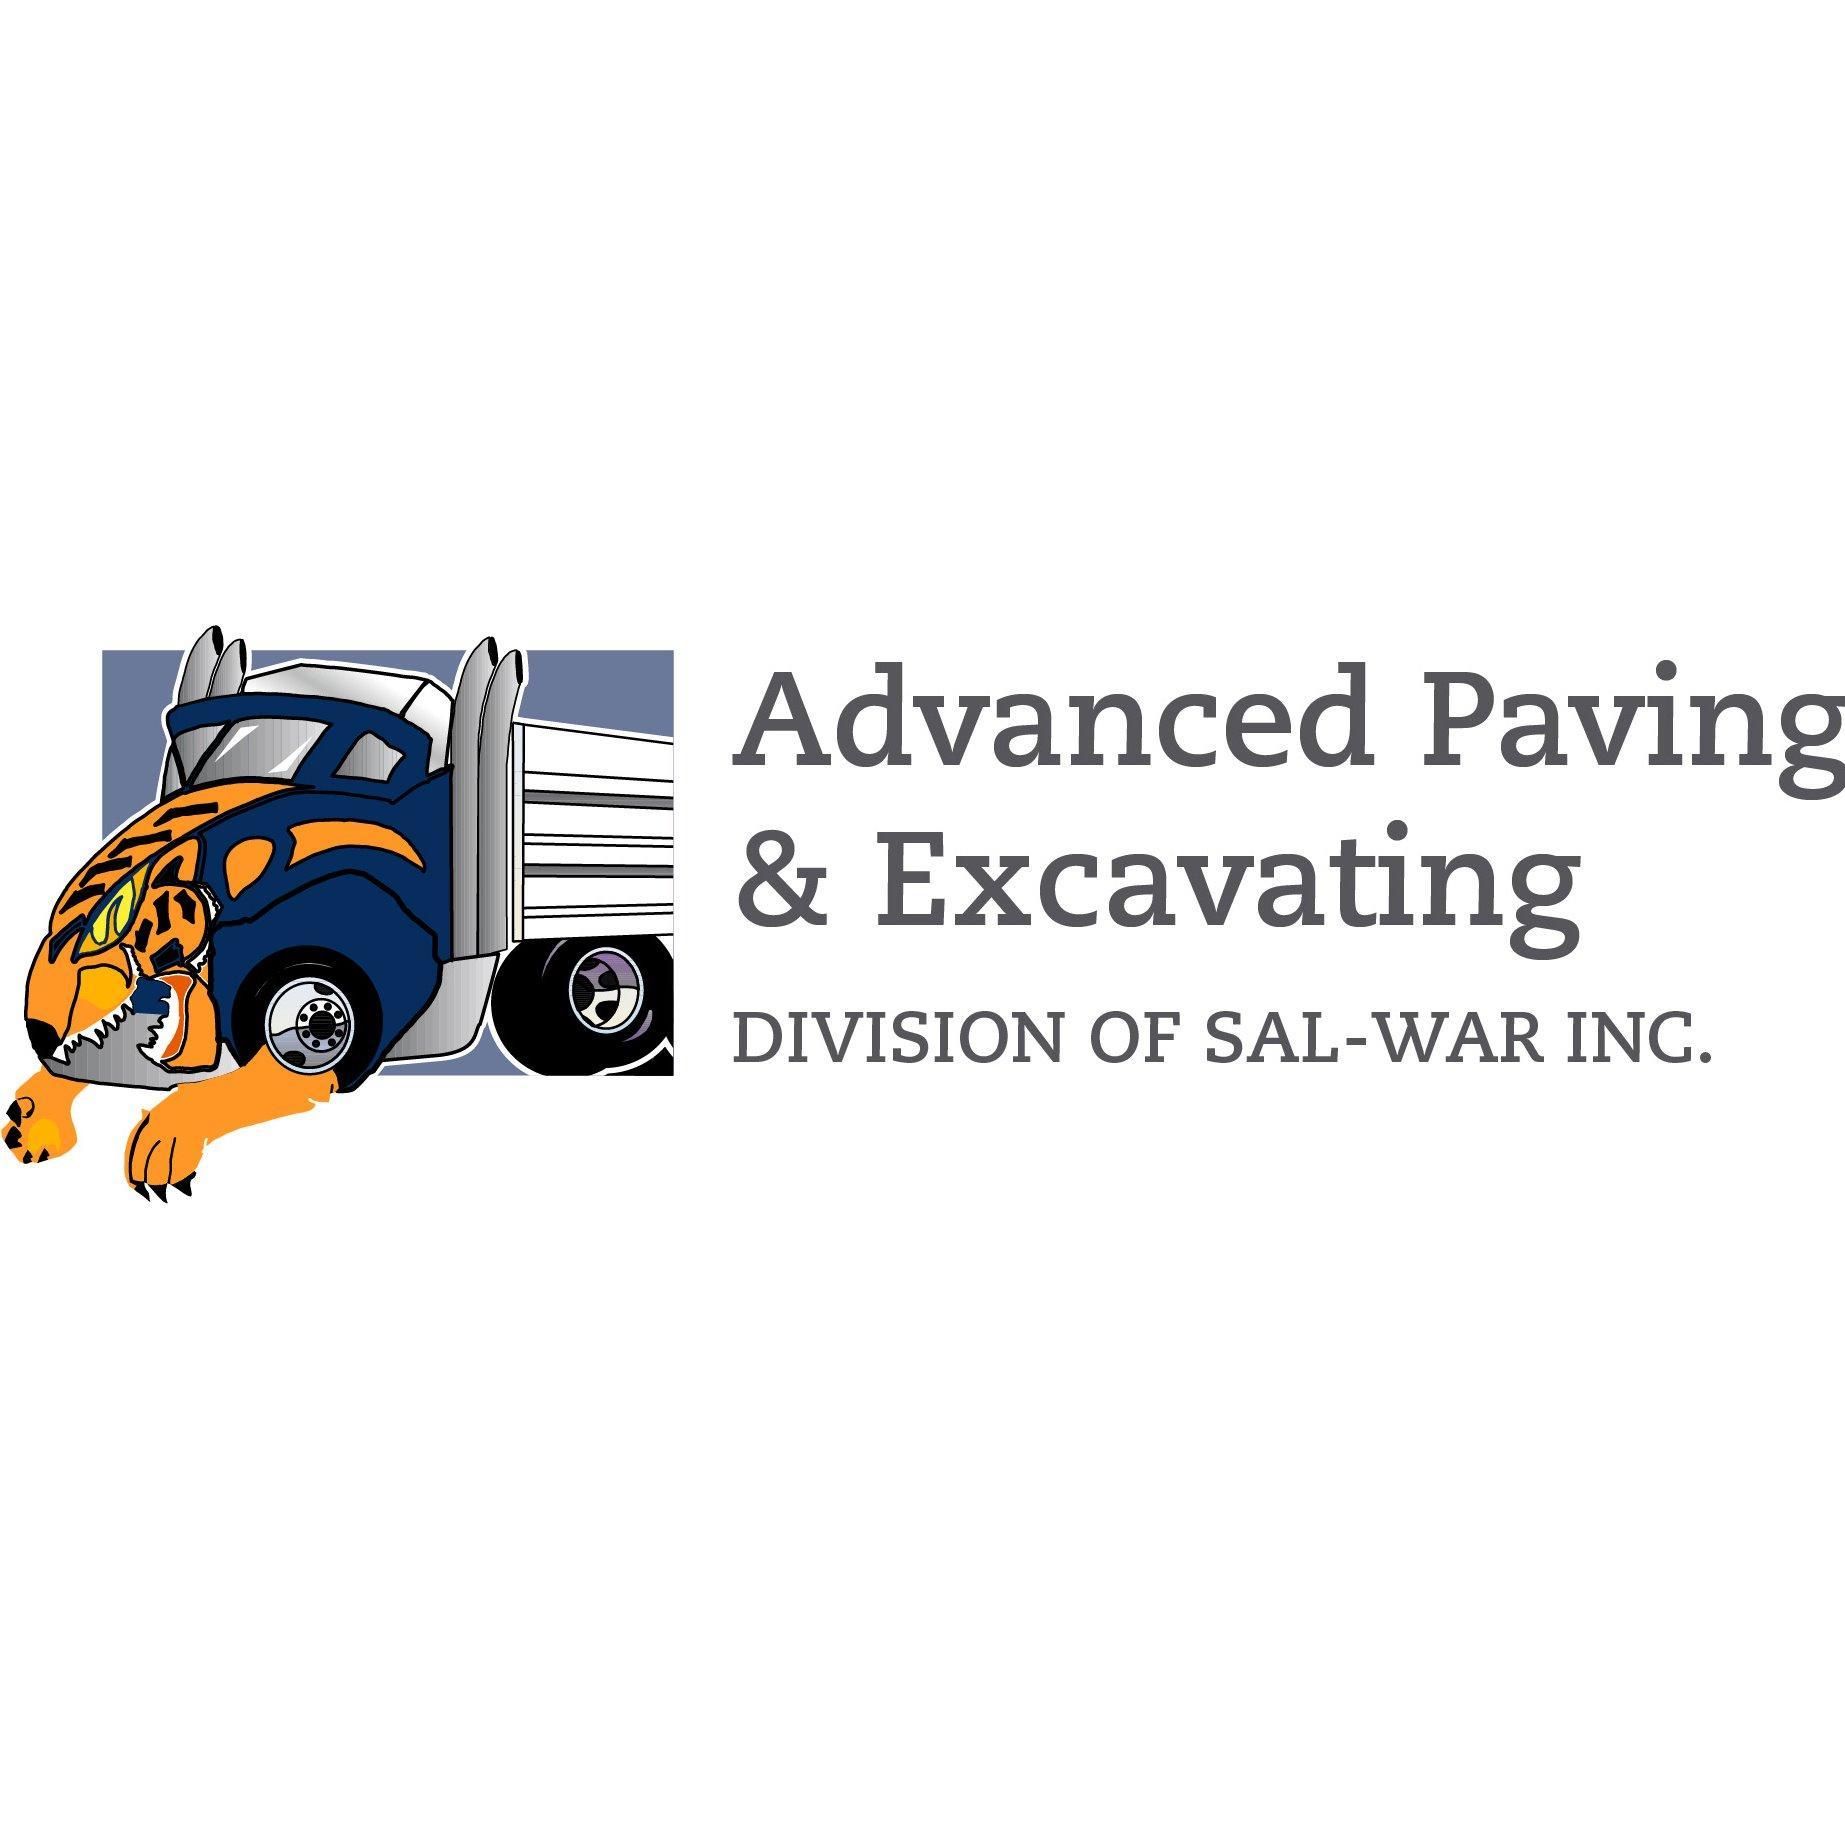 Advanced Paving & Excavating - Woodbridge, CT - Concrete, Brick & Stone